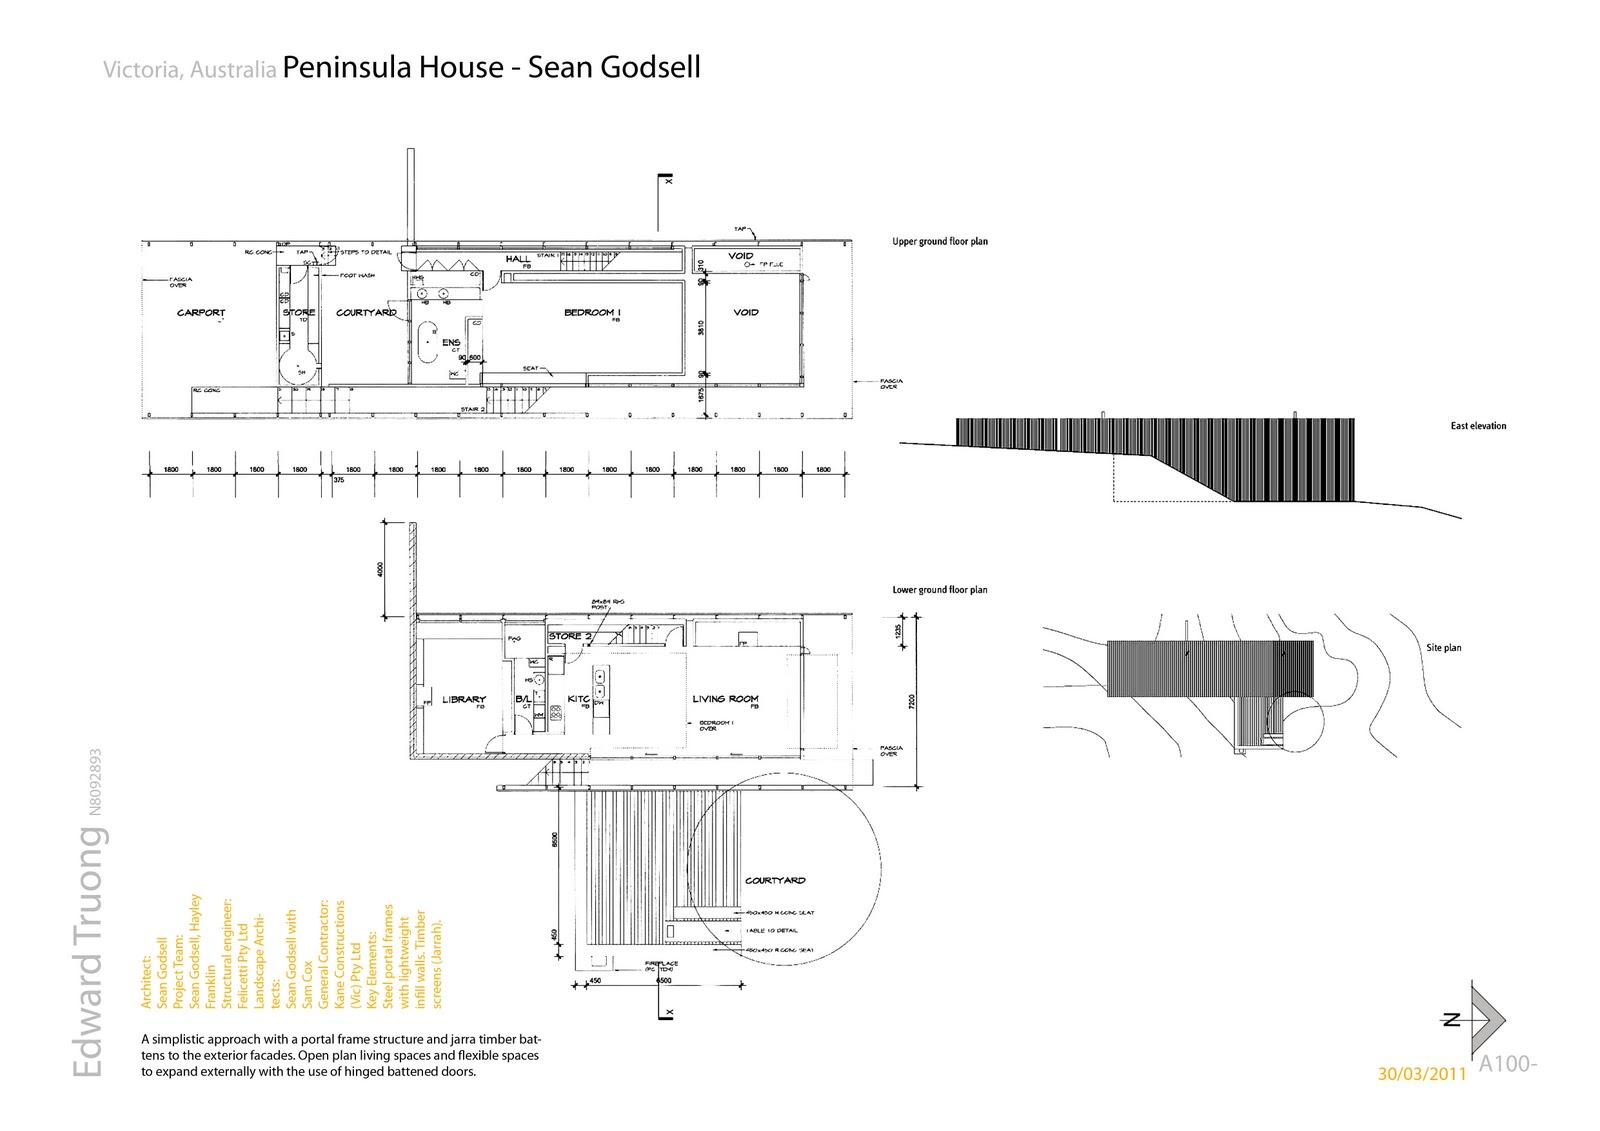 Qut Architecture De40 Project 1a Brief Analysis Of 3